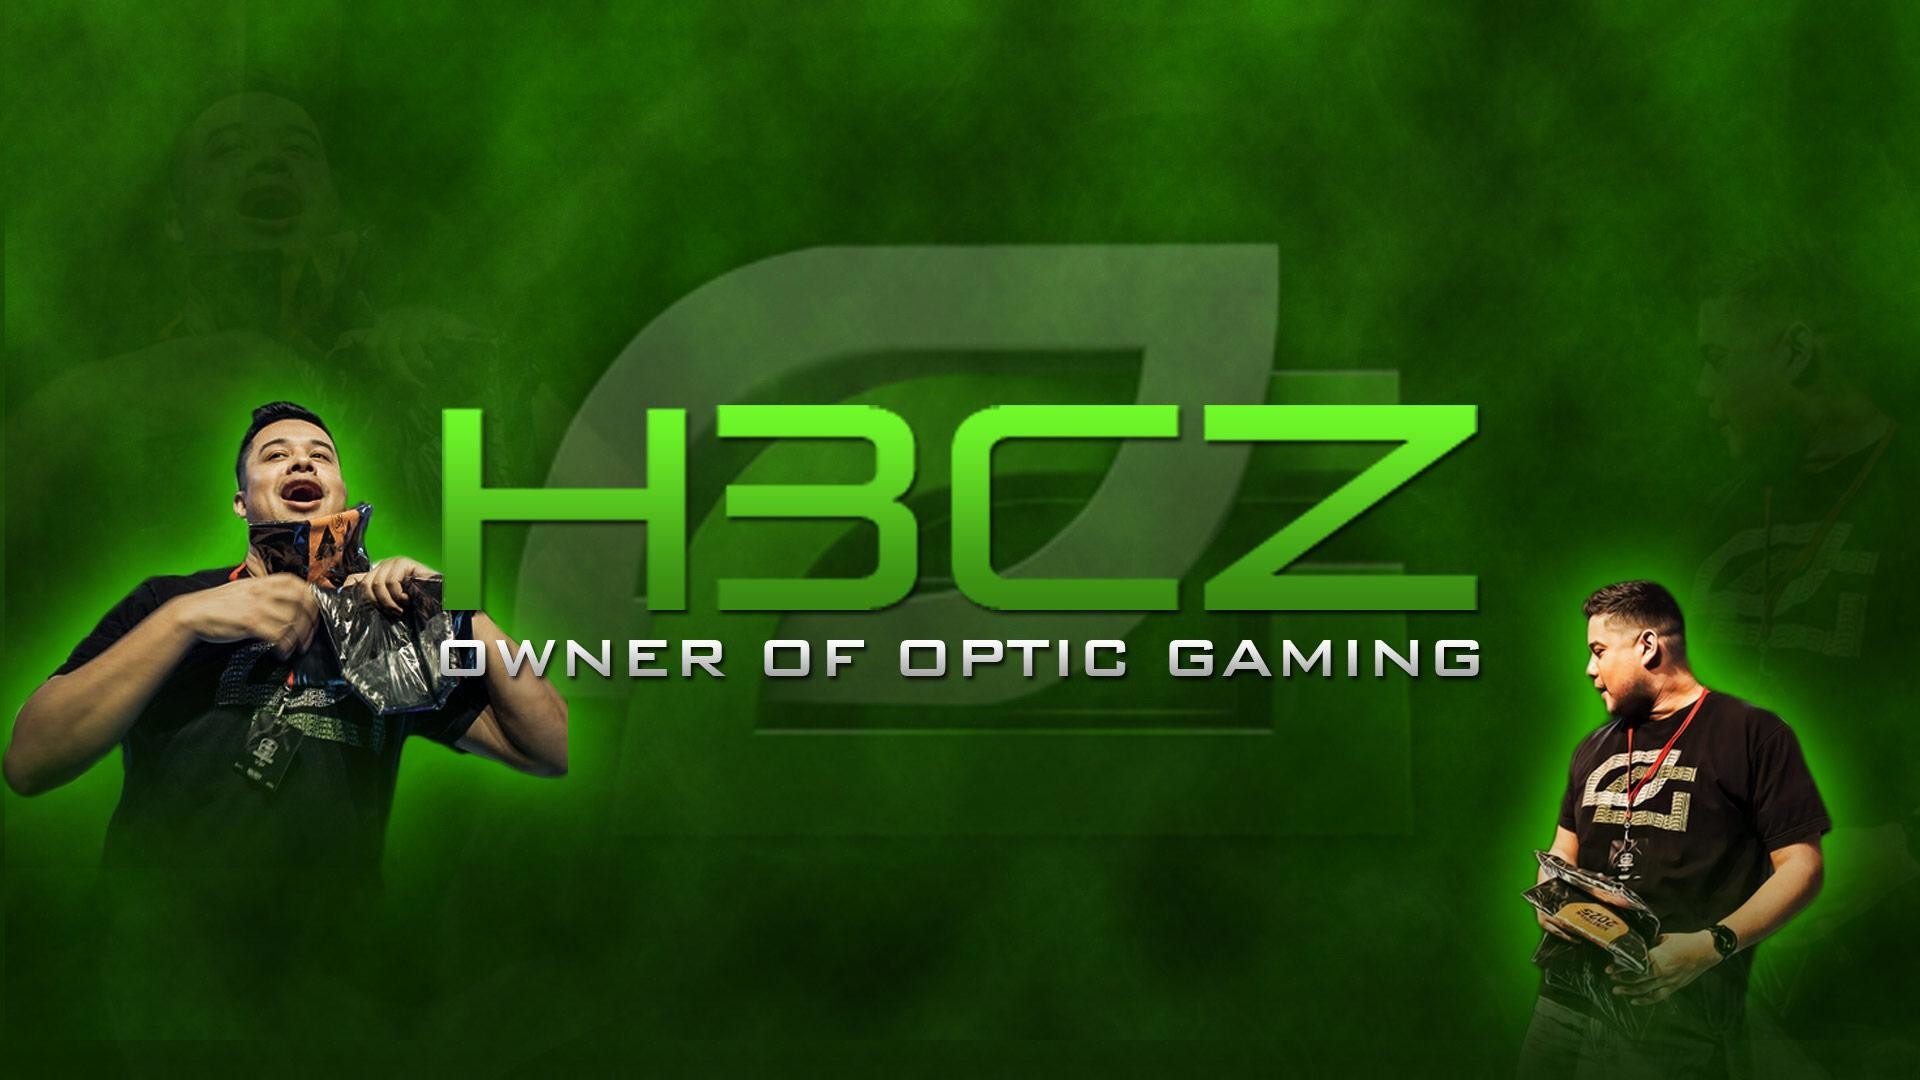 Optic-gaming-roster-photo-wallpaper